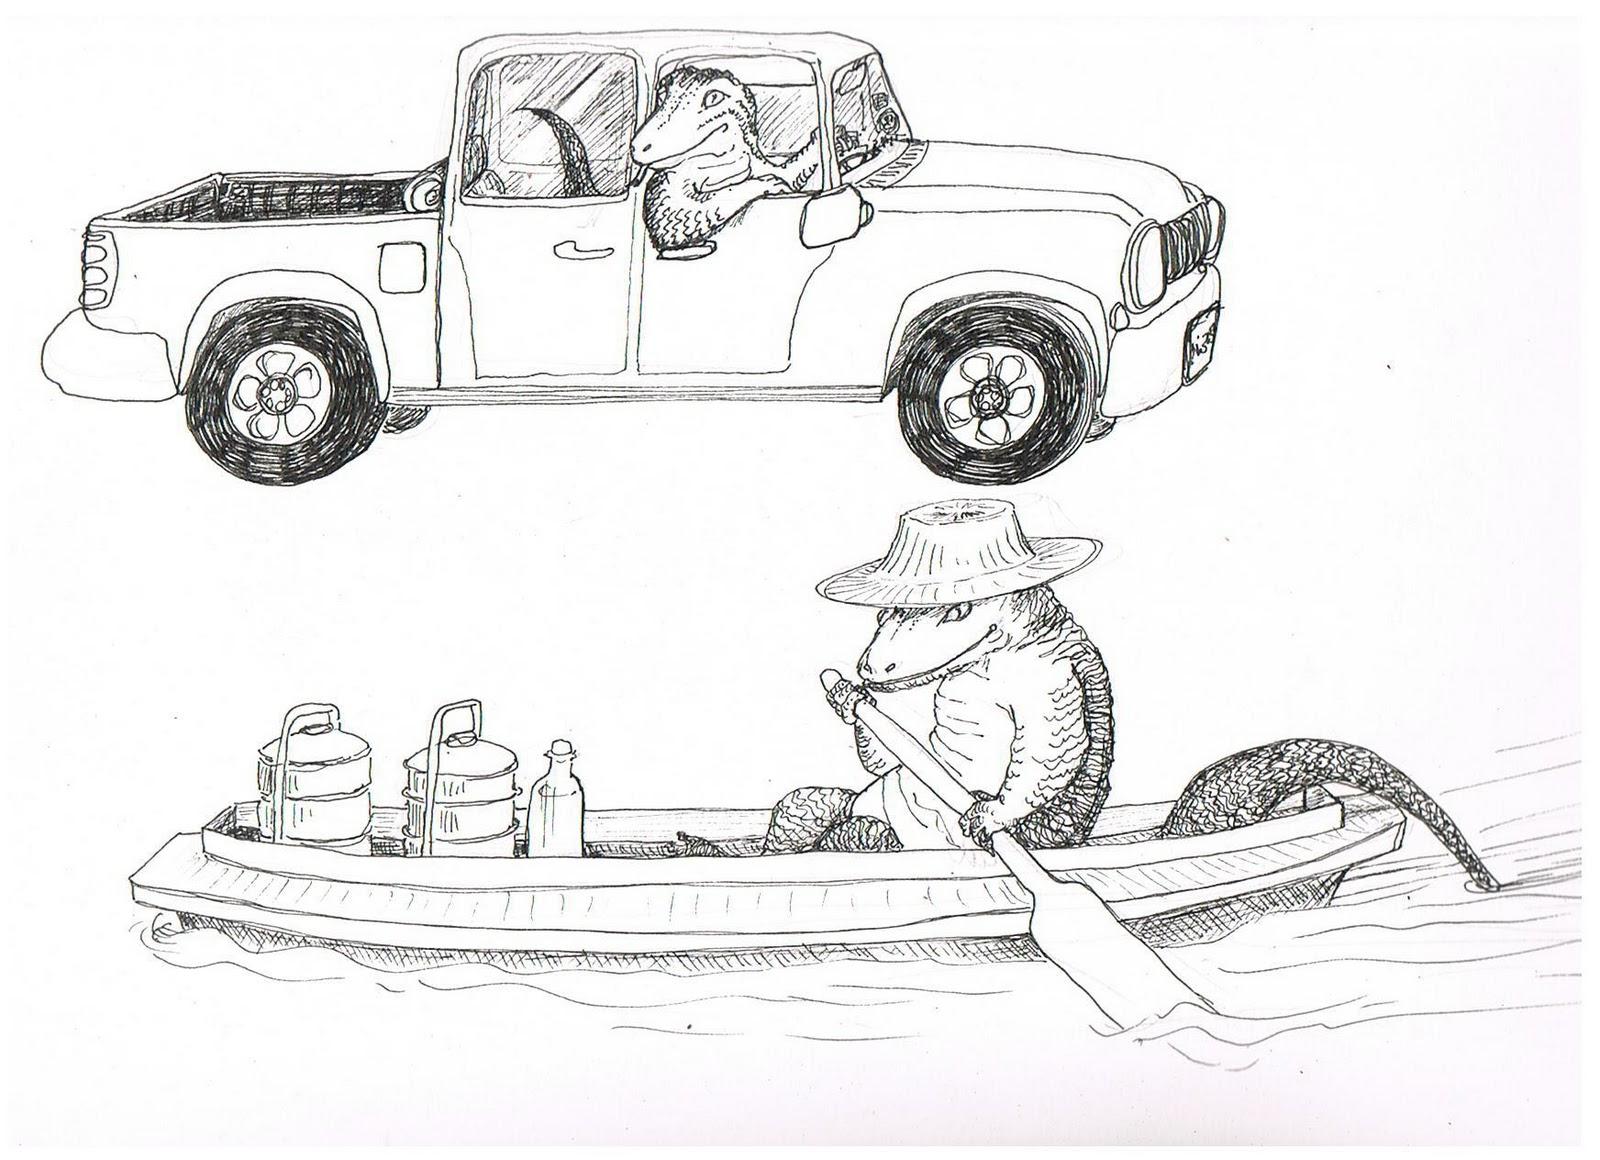 Ajarn Cartoon January